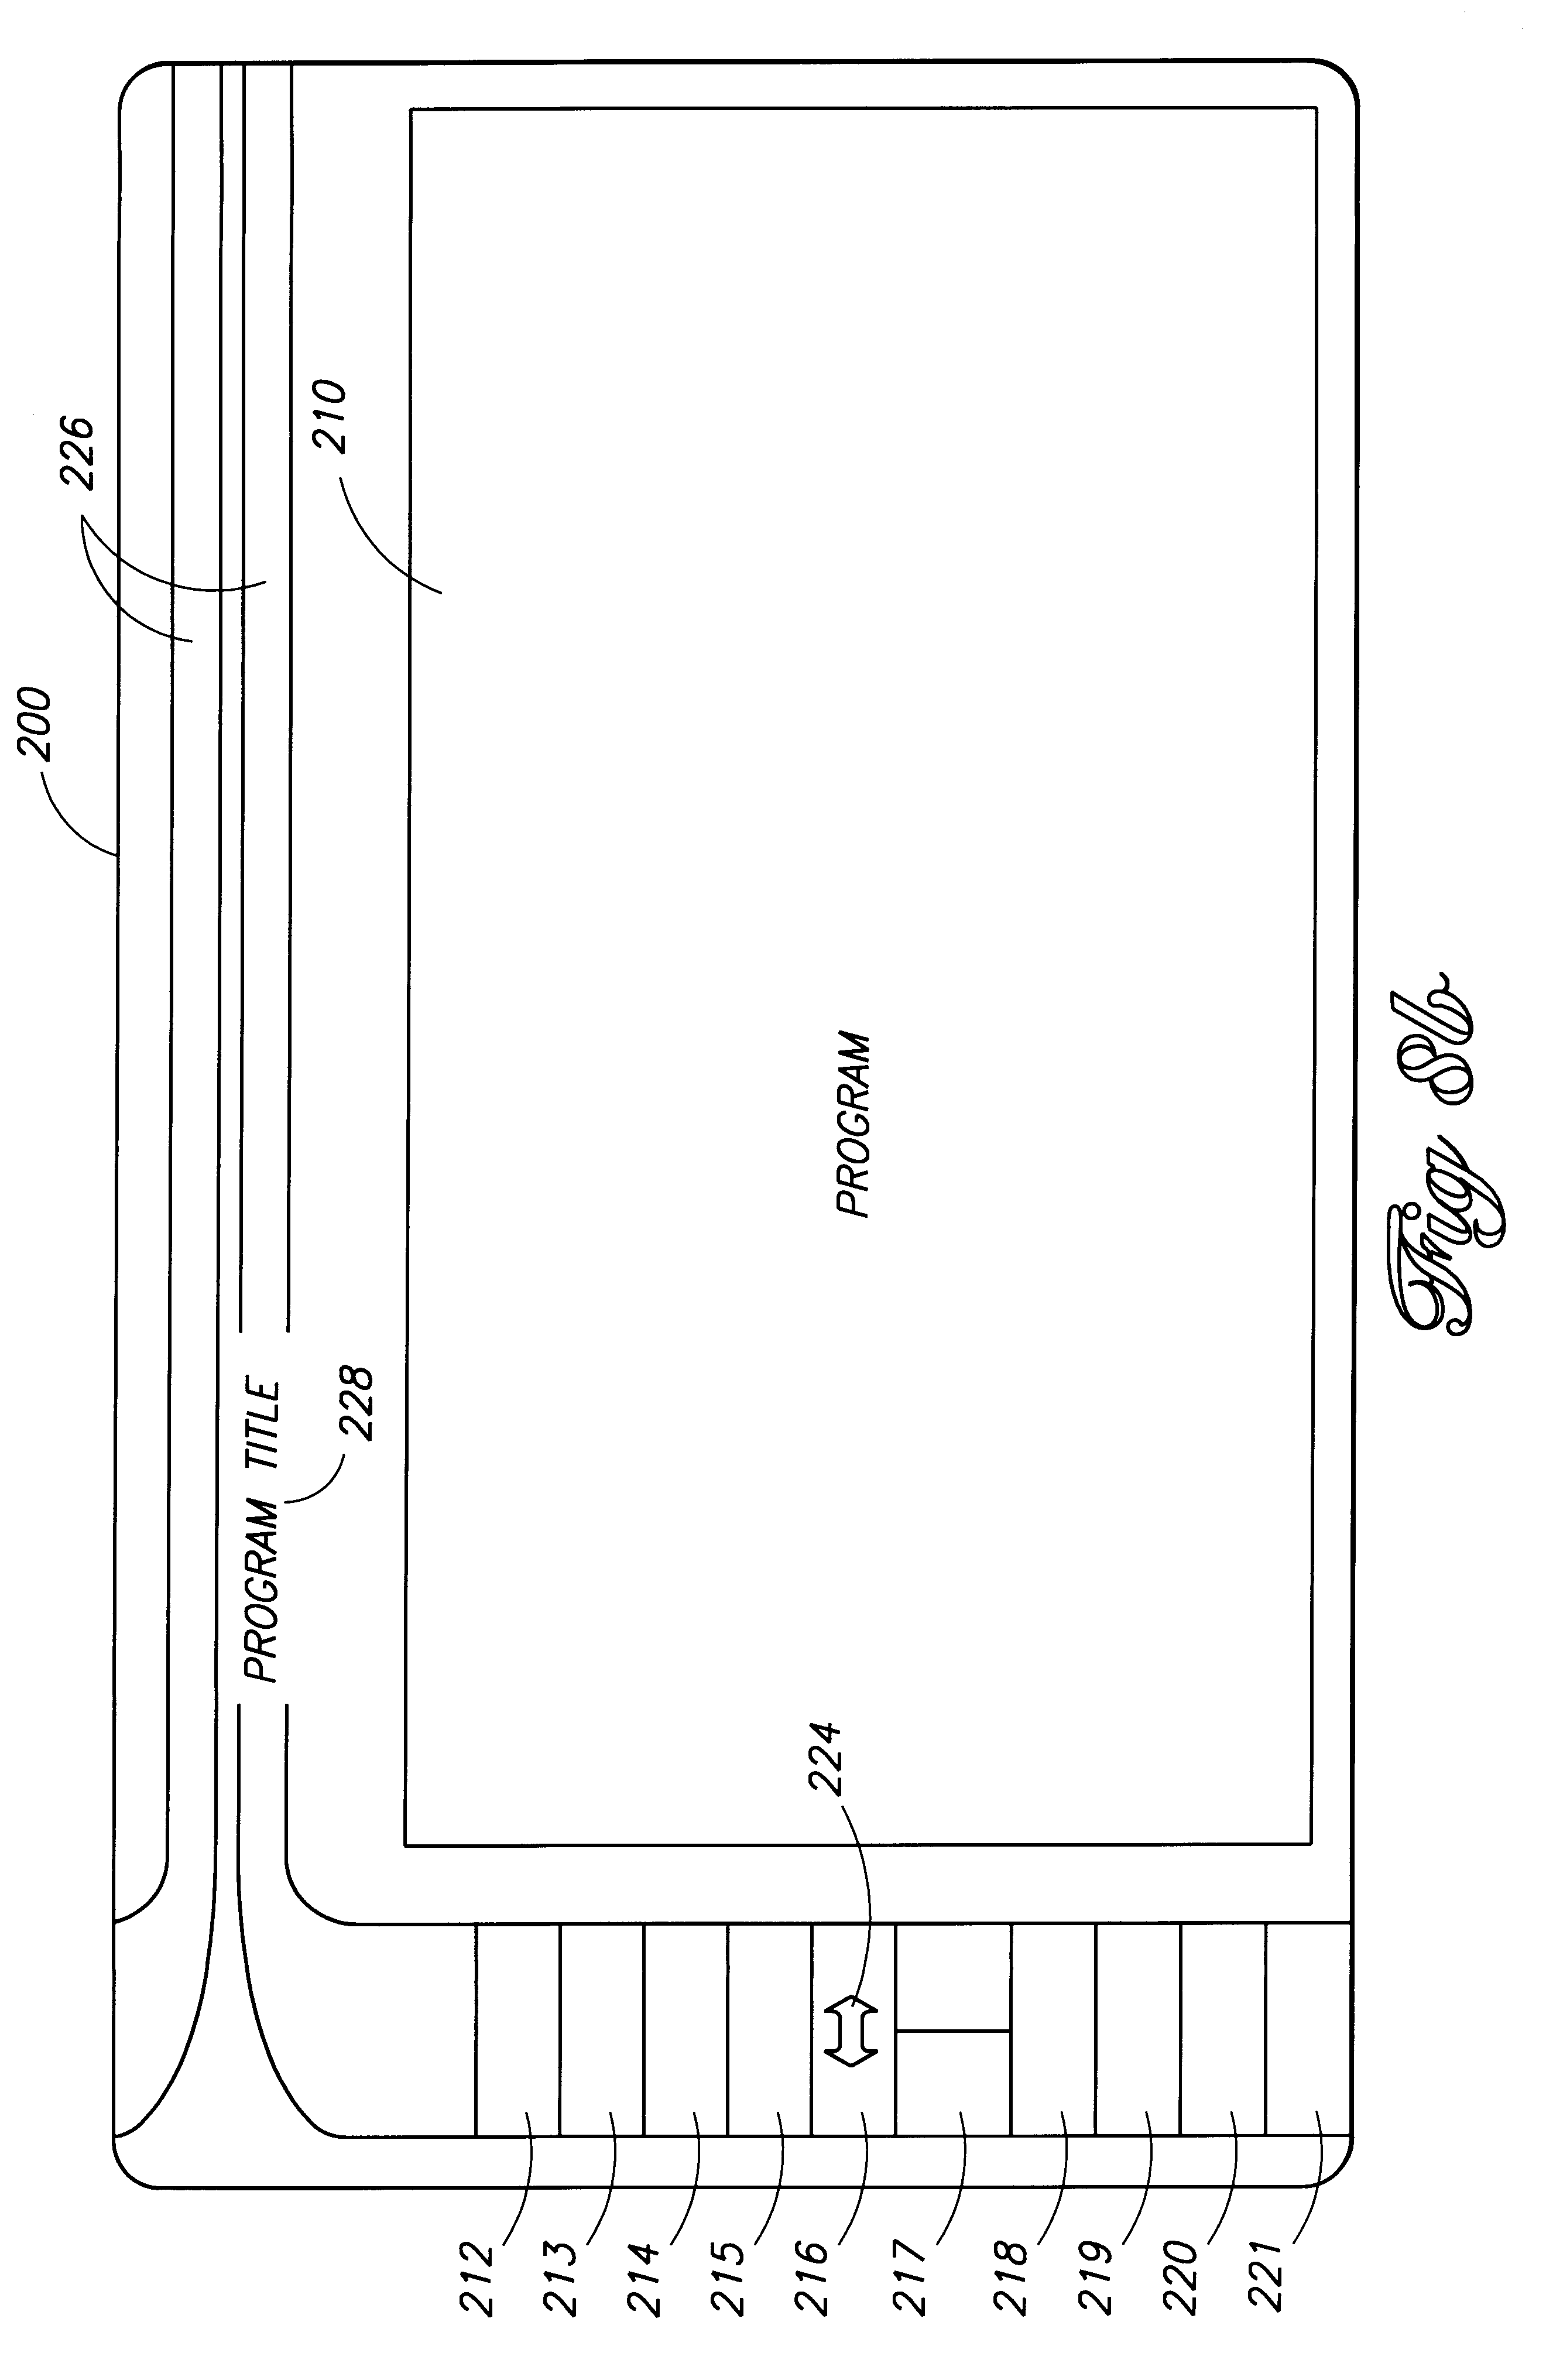 Patent US 6,240,555 B1